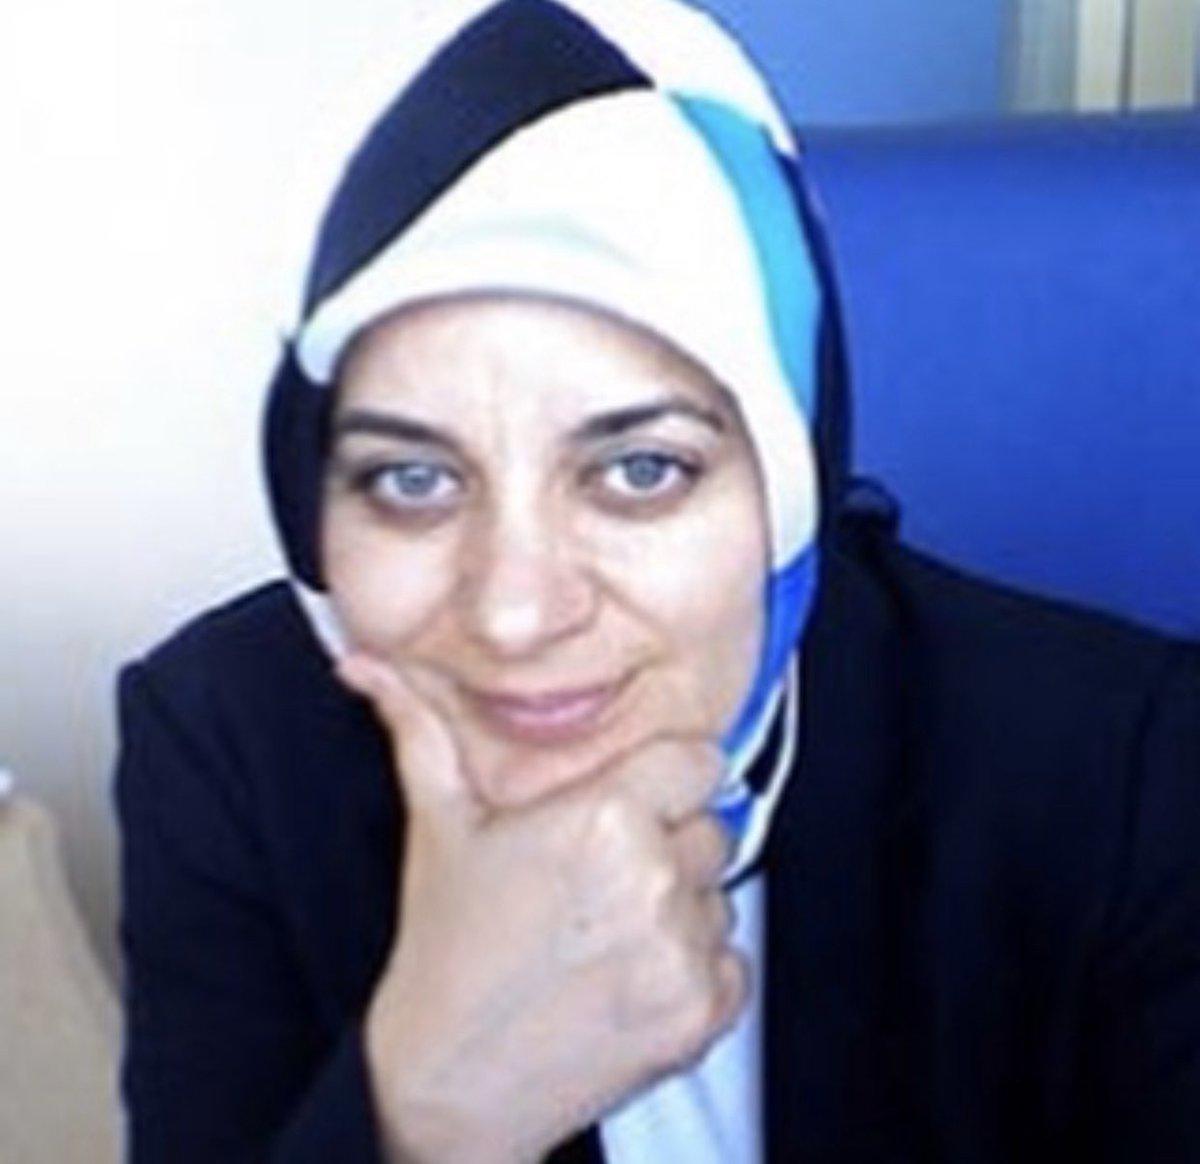 #Yemin #ReyEm #ÖzBerk @yemindizisi @kanal7 @KaramelYapimpic.twitter.com/SJlyUJjwJU